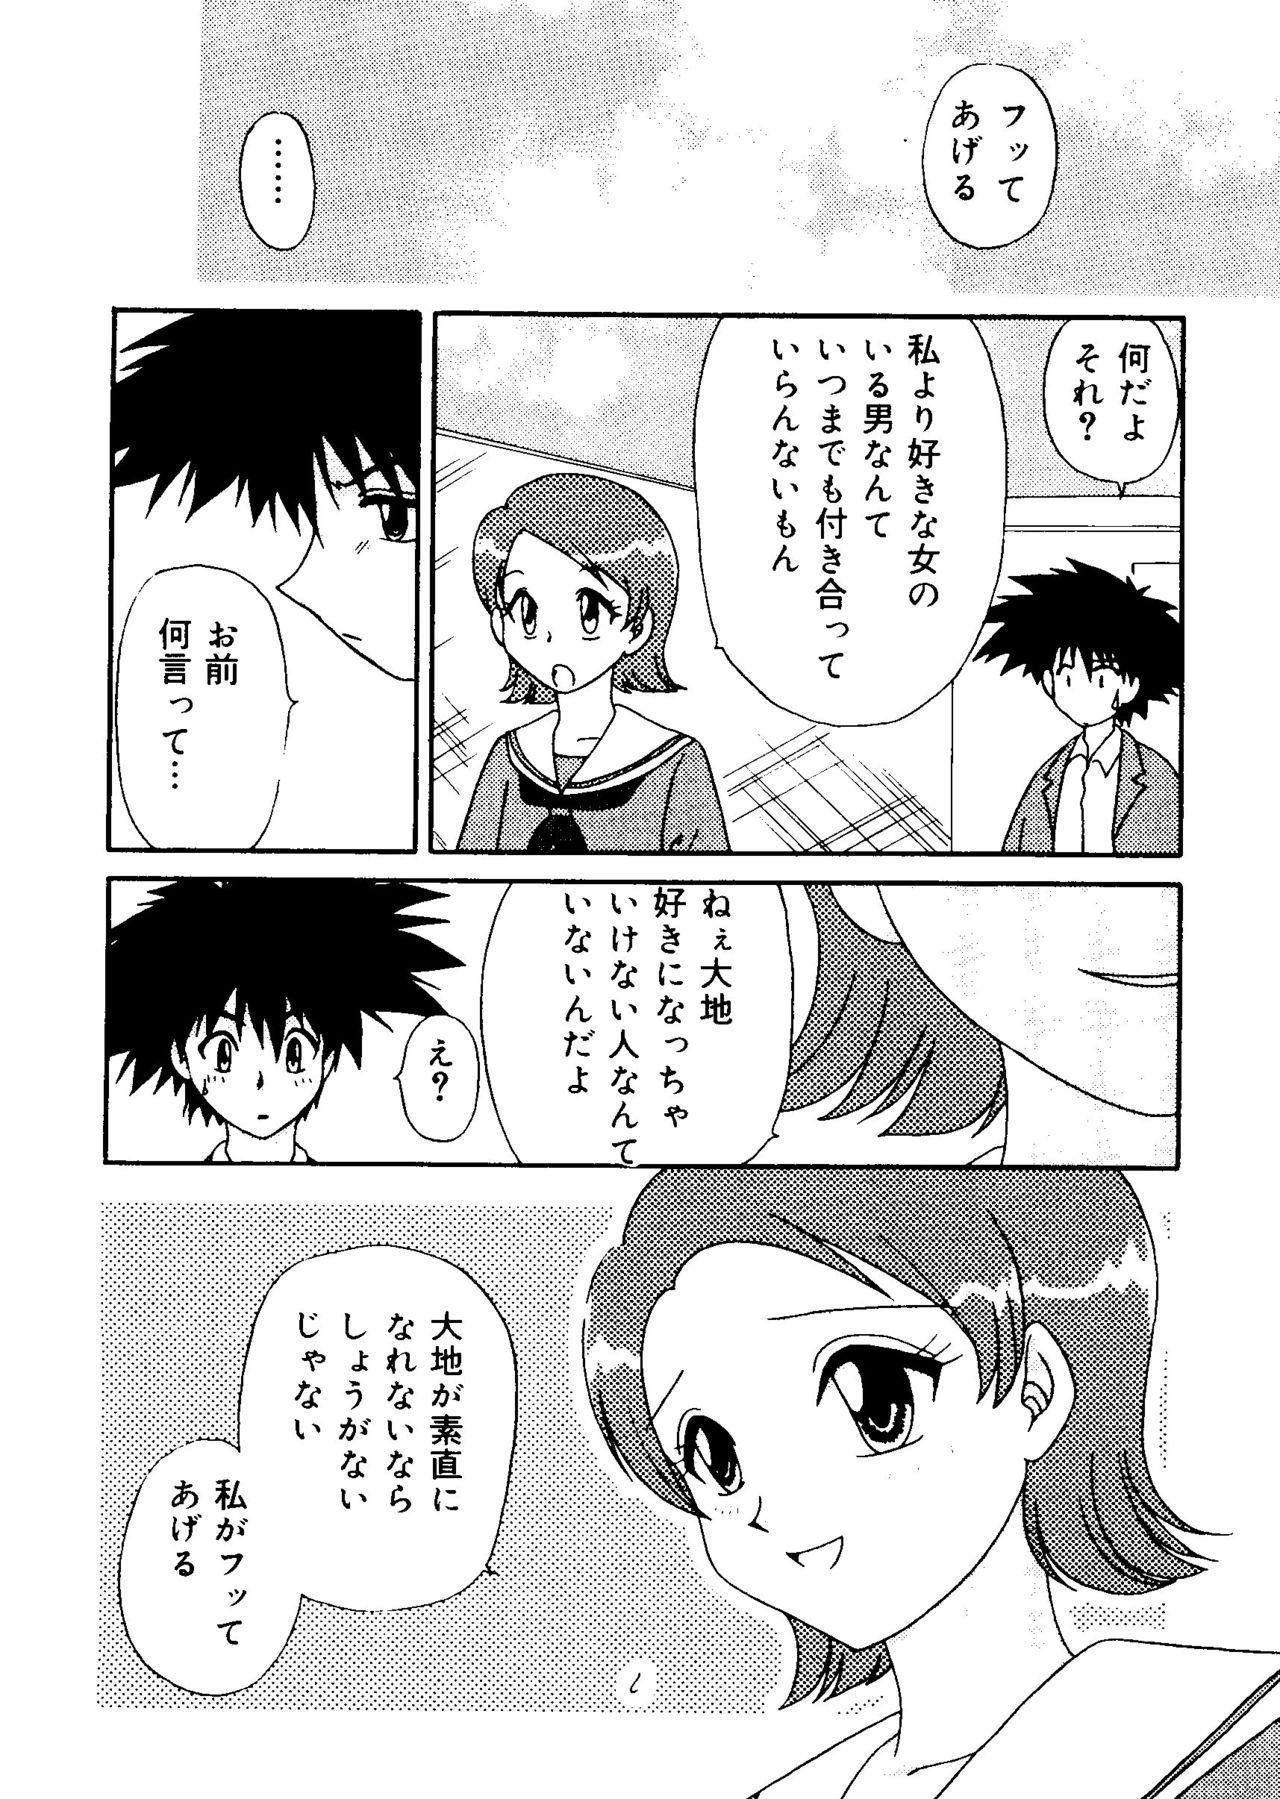 Love Chara Taizen No. 12 123